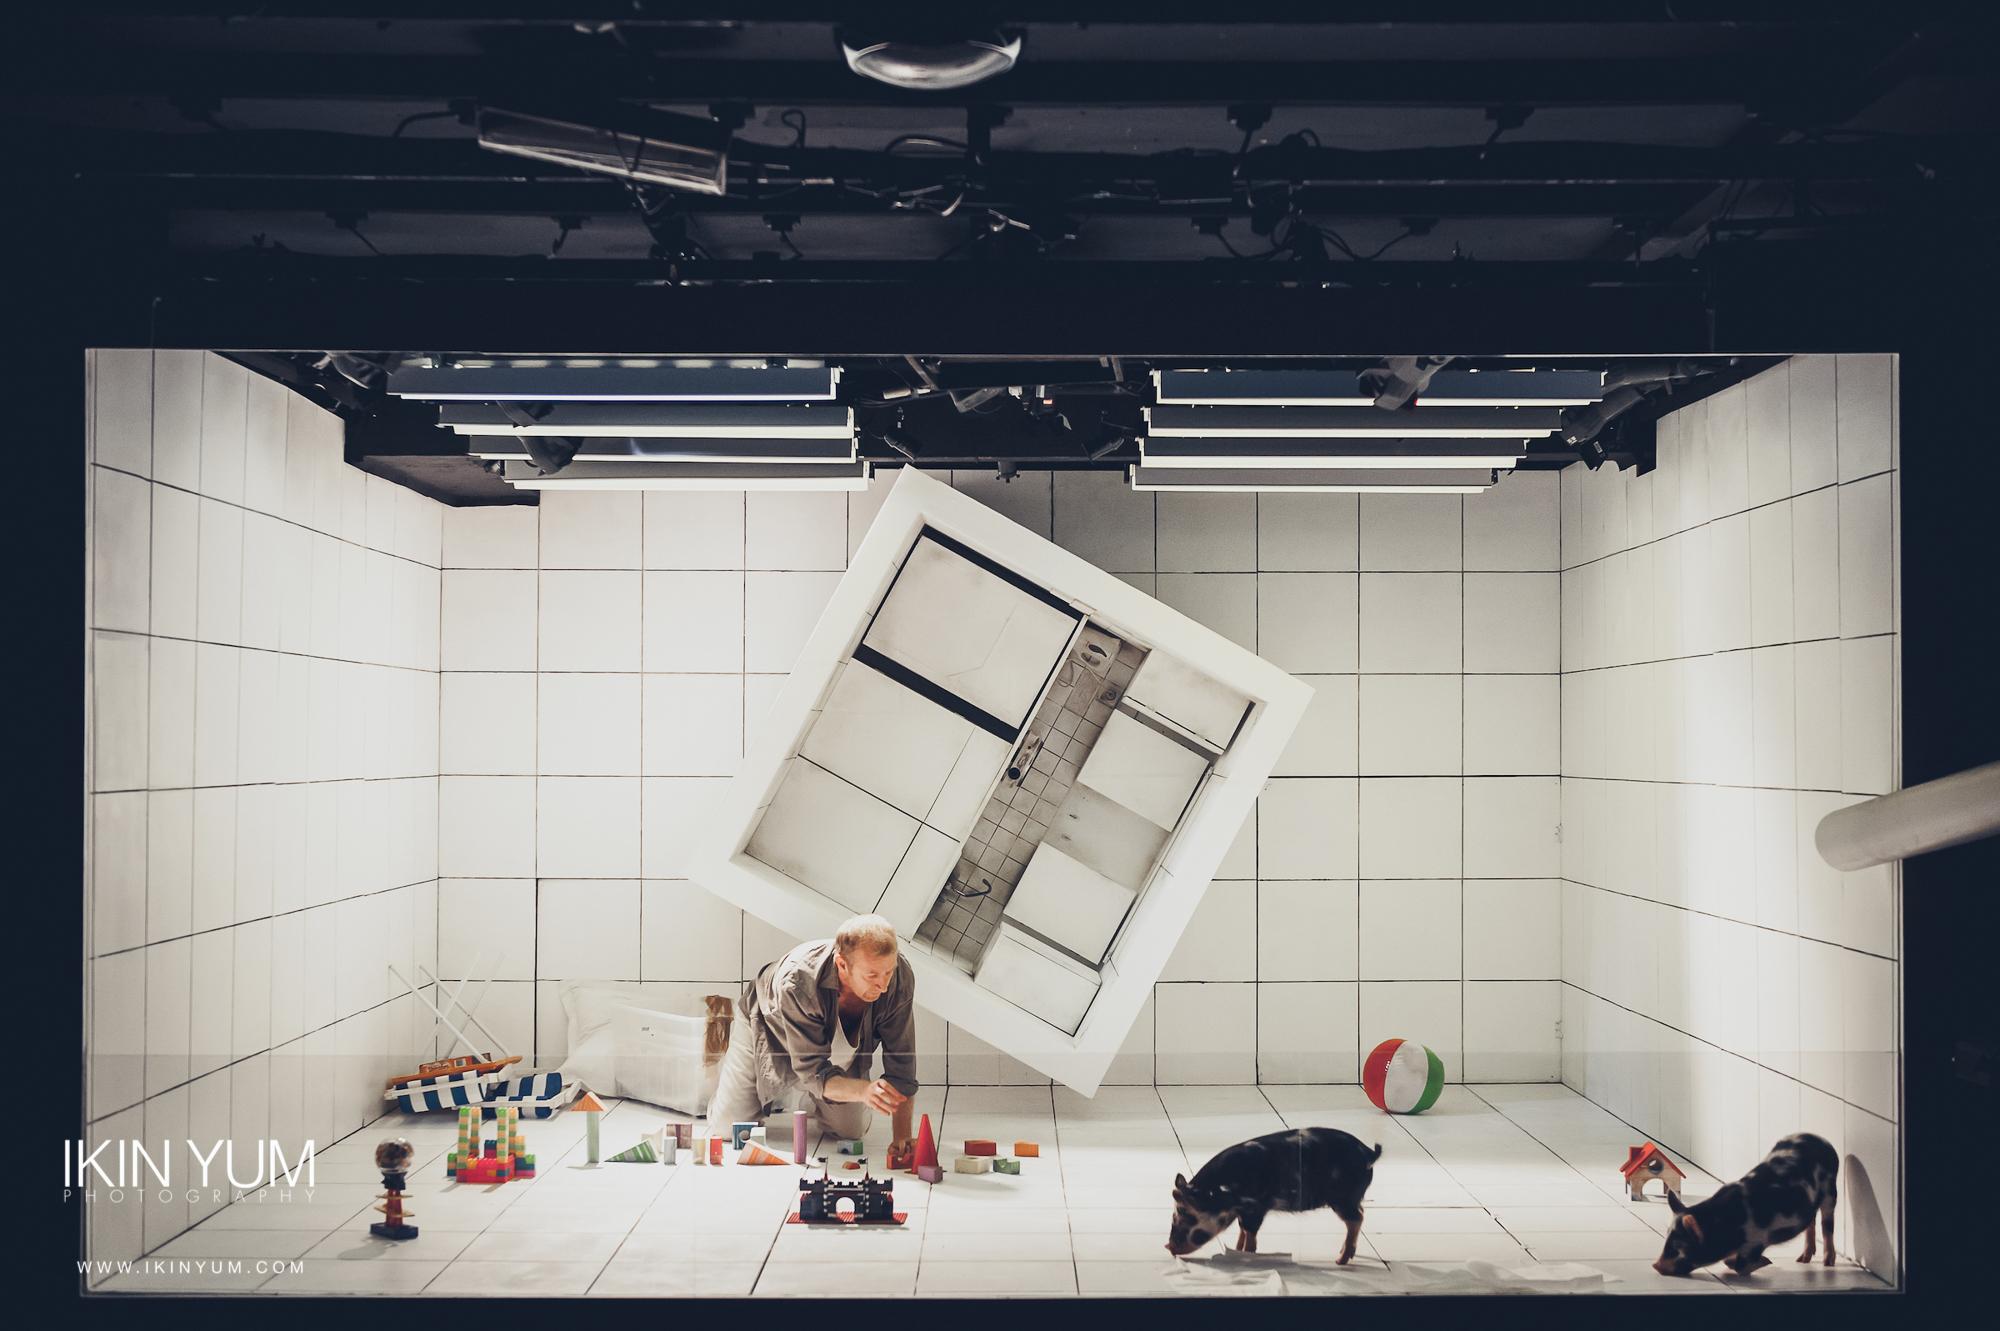 Goya - Gate theatre - Ikin Yum Photography-046.jpg